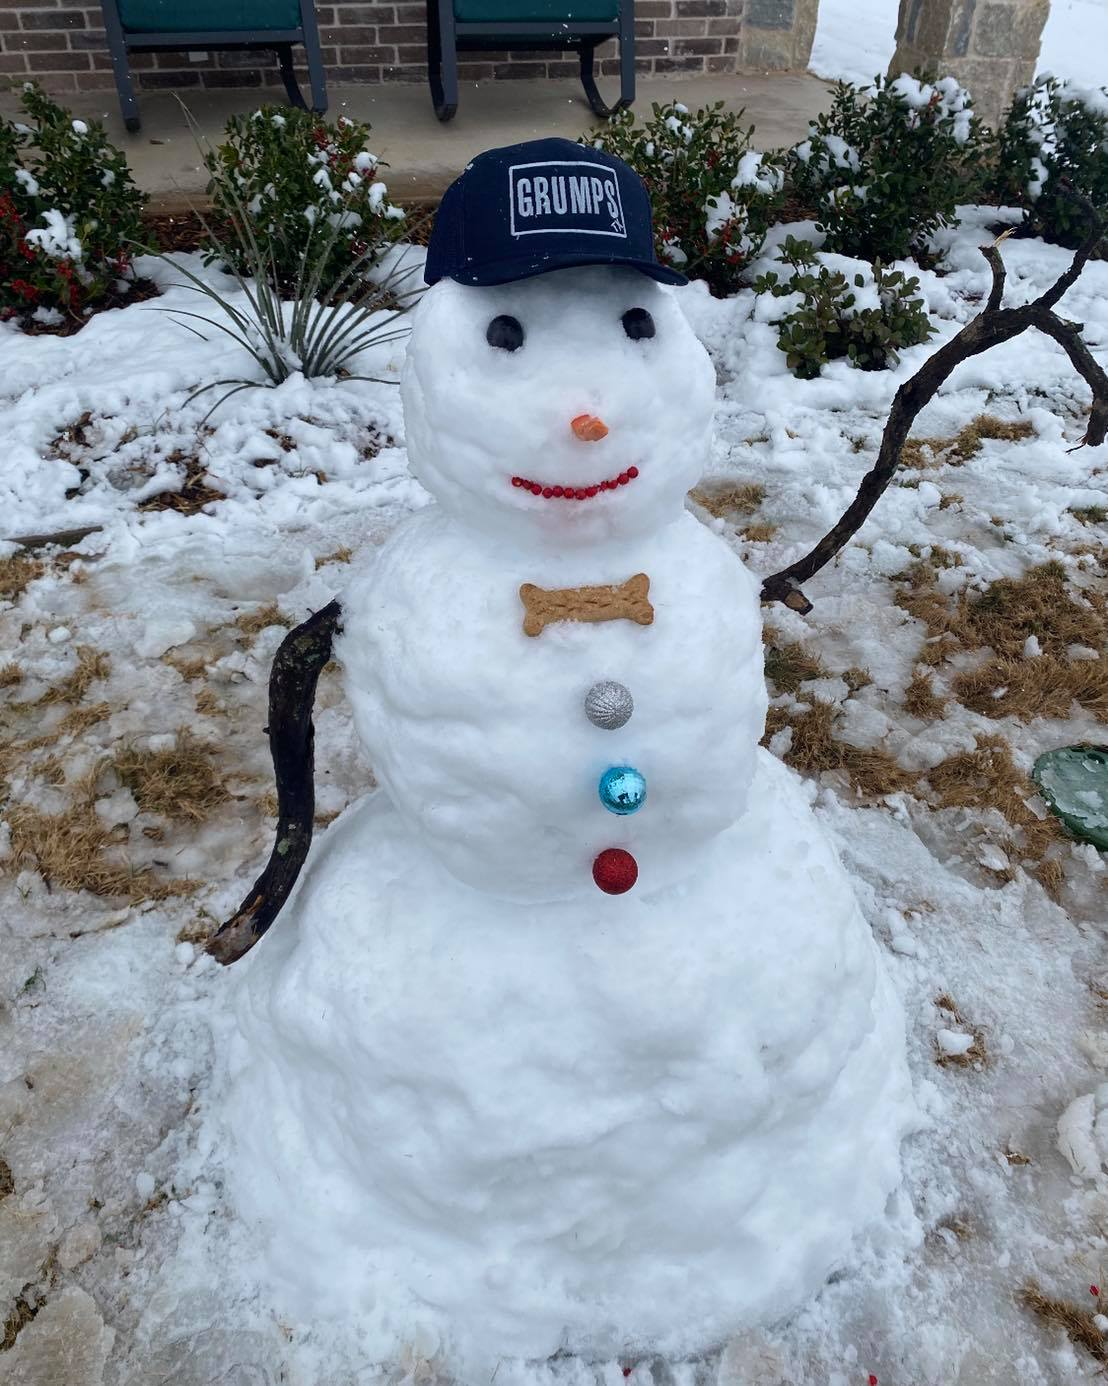 Grumps-snowman